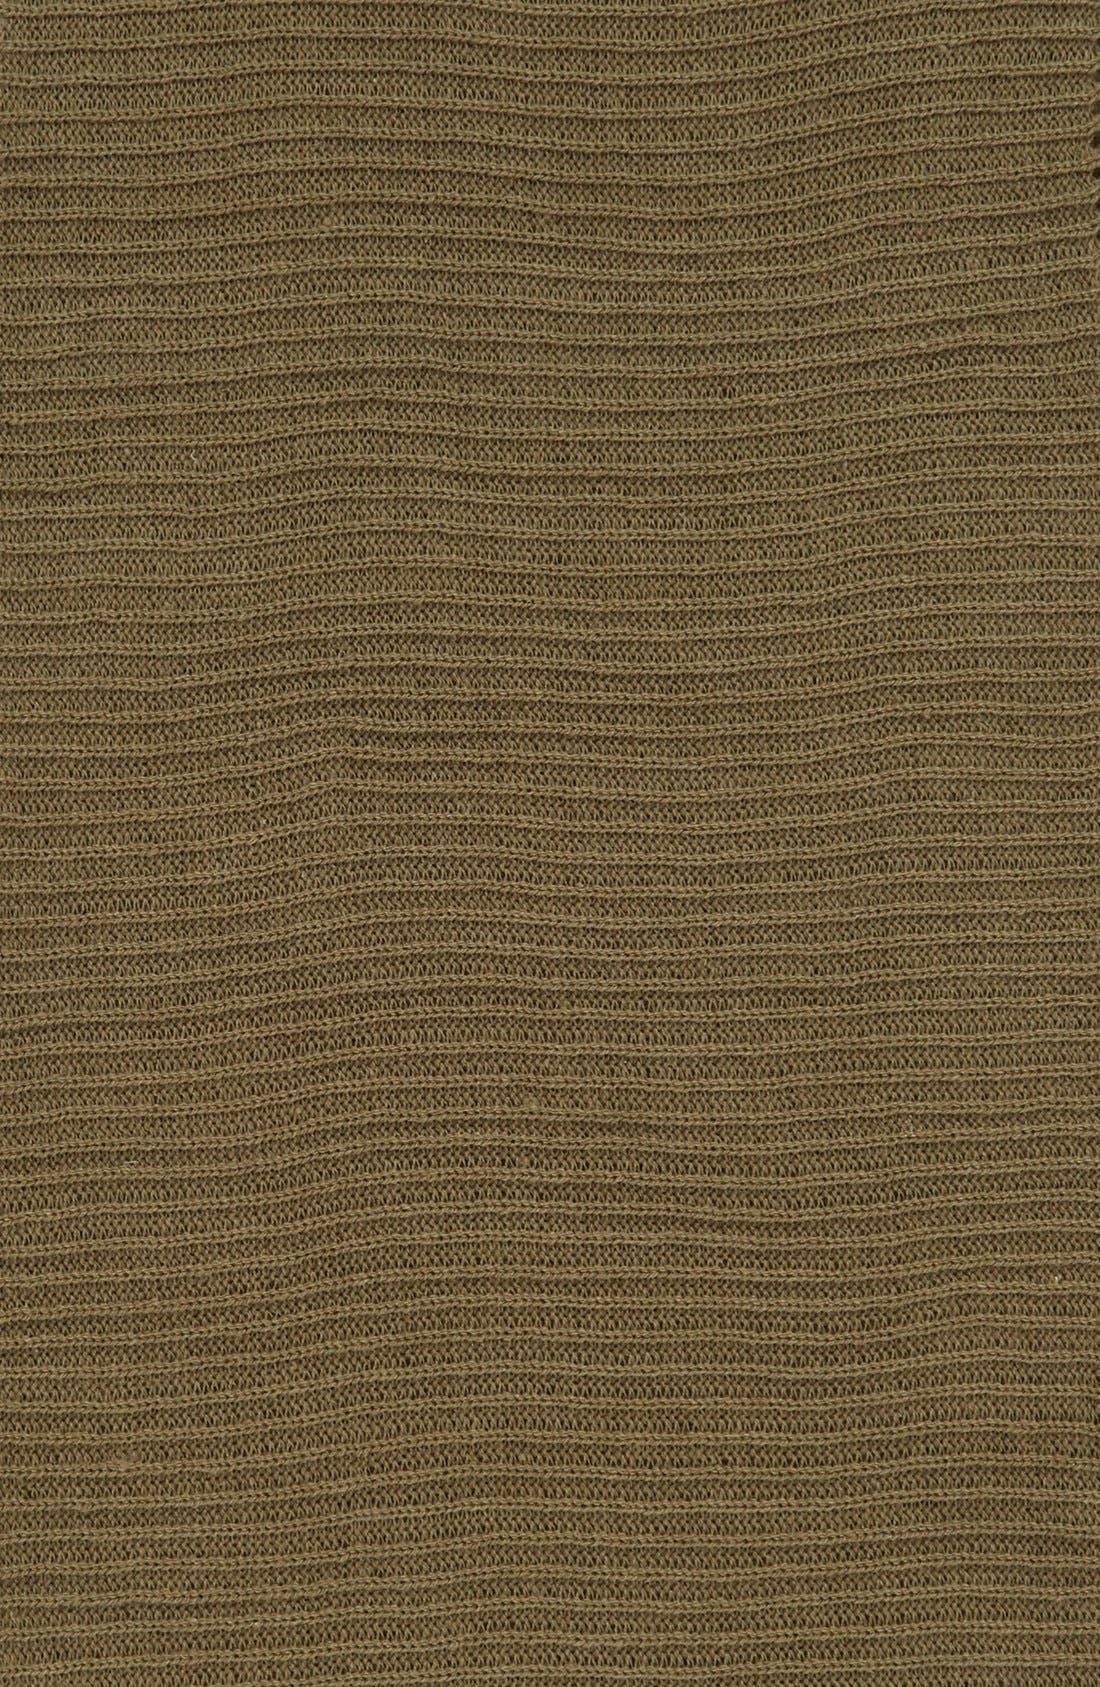 Rib Knit Fringe Infinity Scarf,                             Alternate thumbnail 9, color,